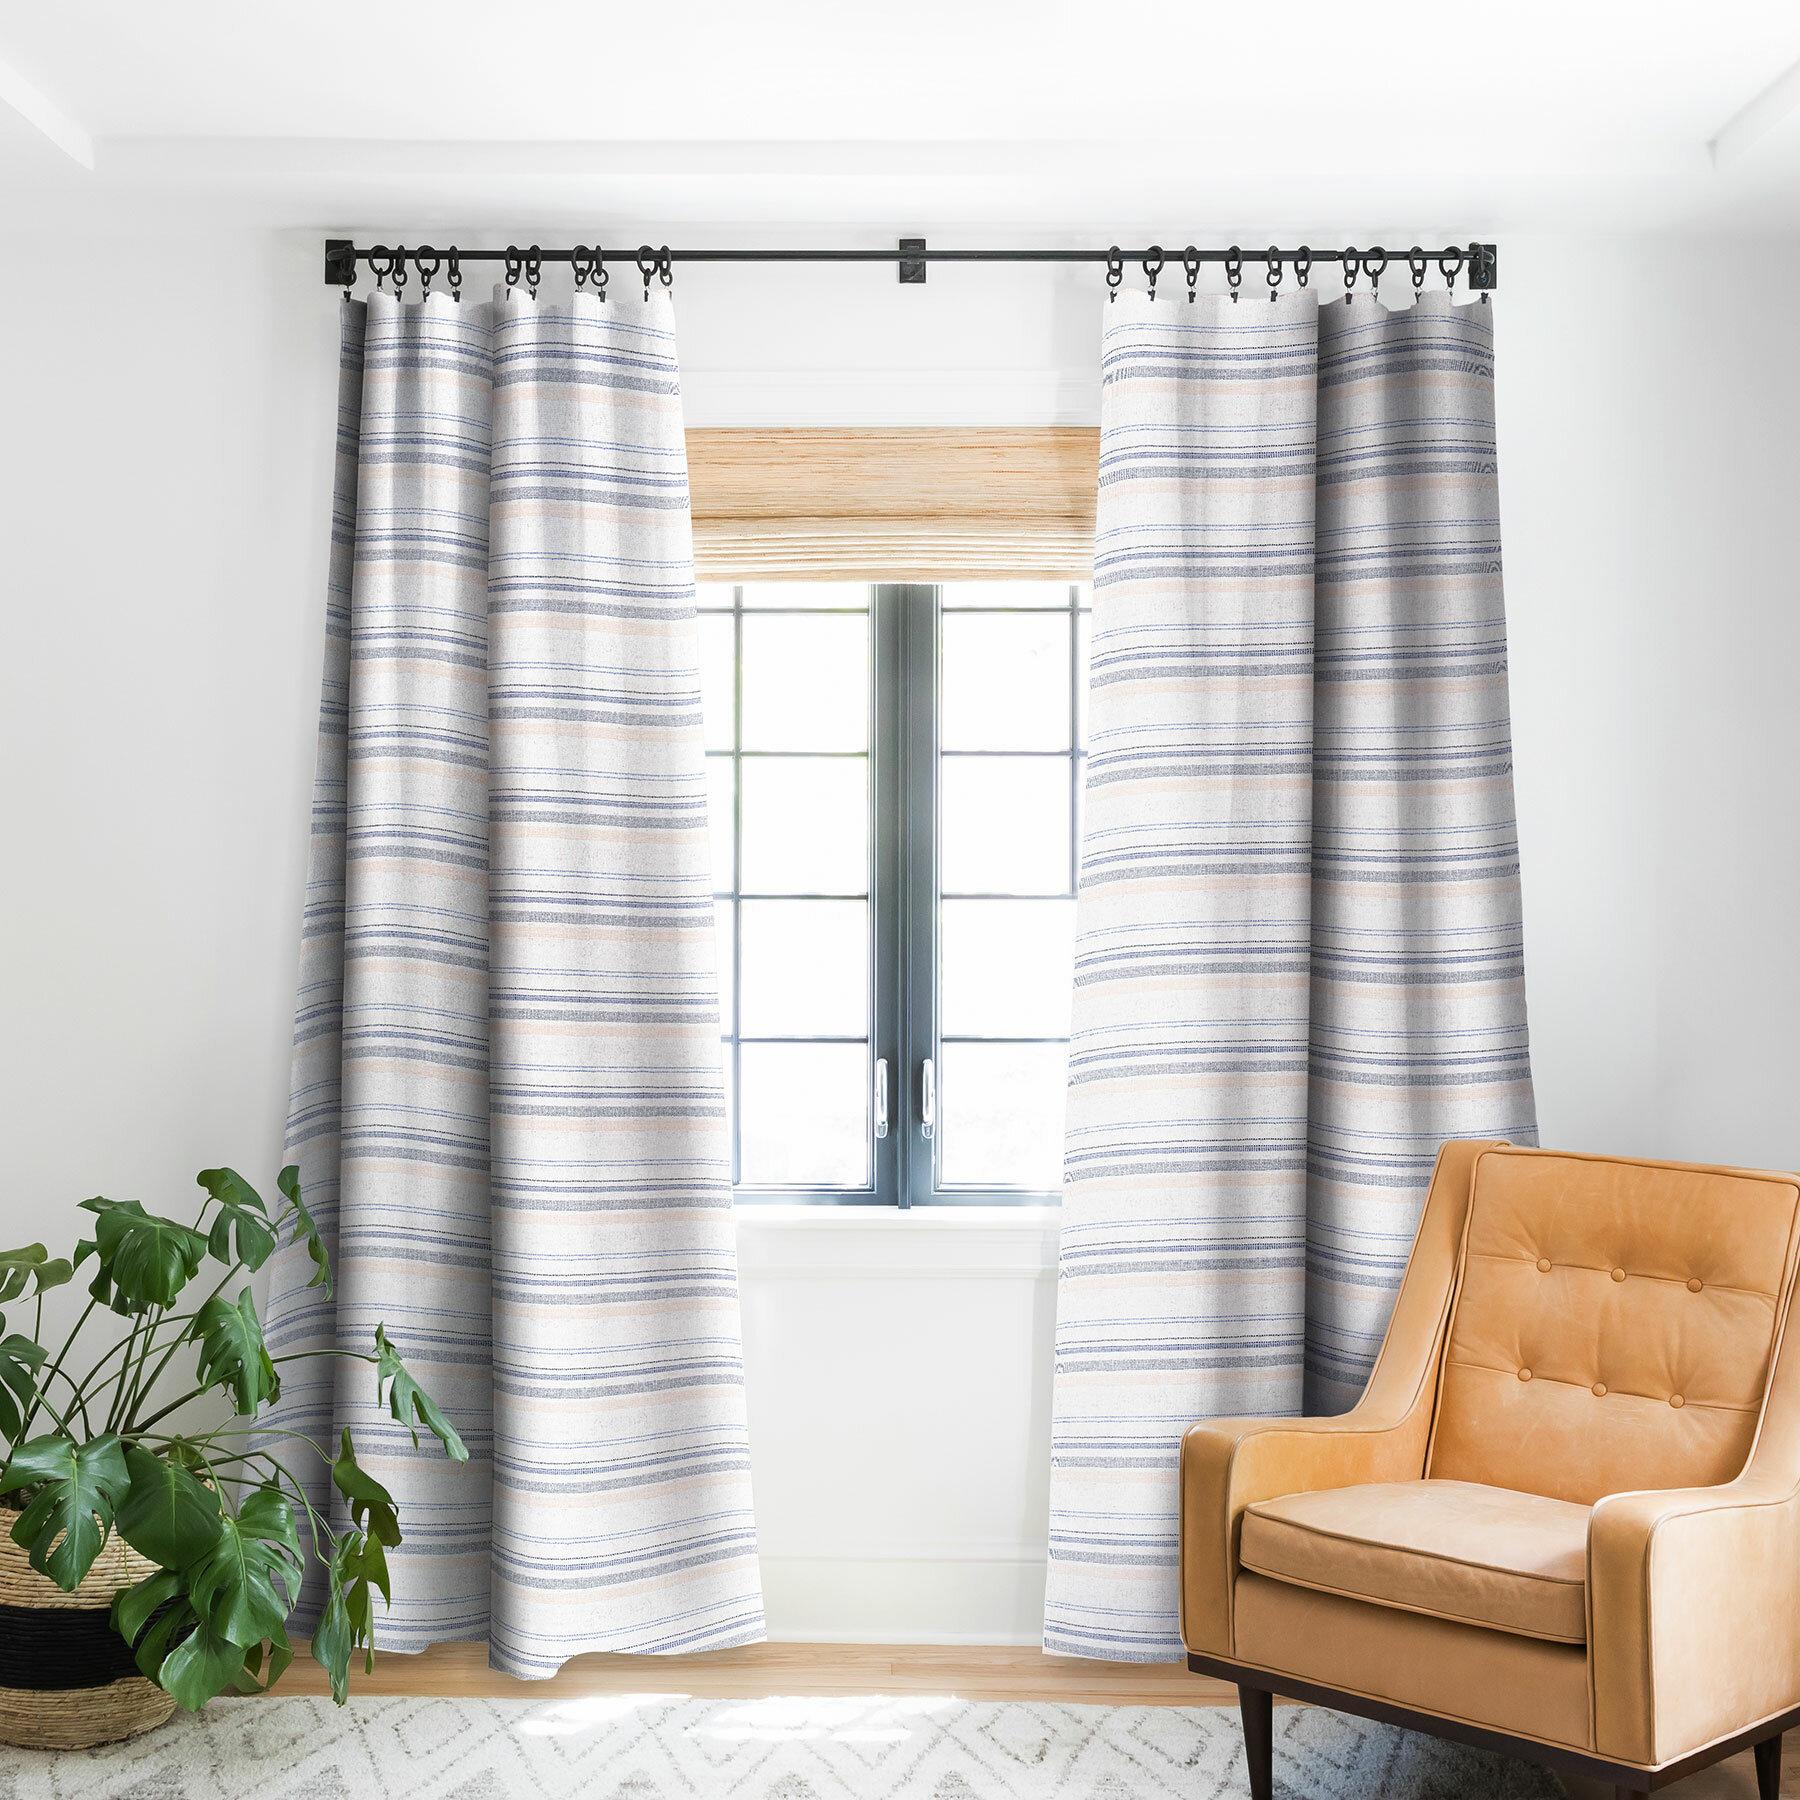 East Urban Home Holli Zollinger French Linen Striped Blackout Rod Pocket Curtain Panel Reviews Wayfair